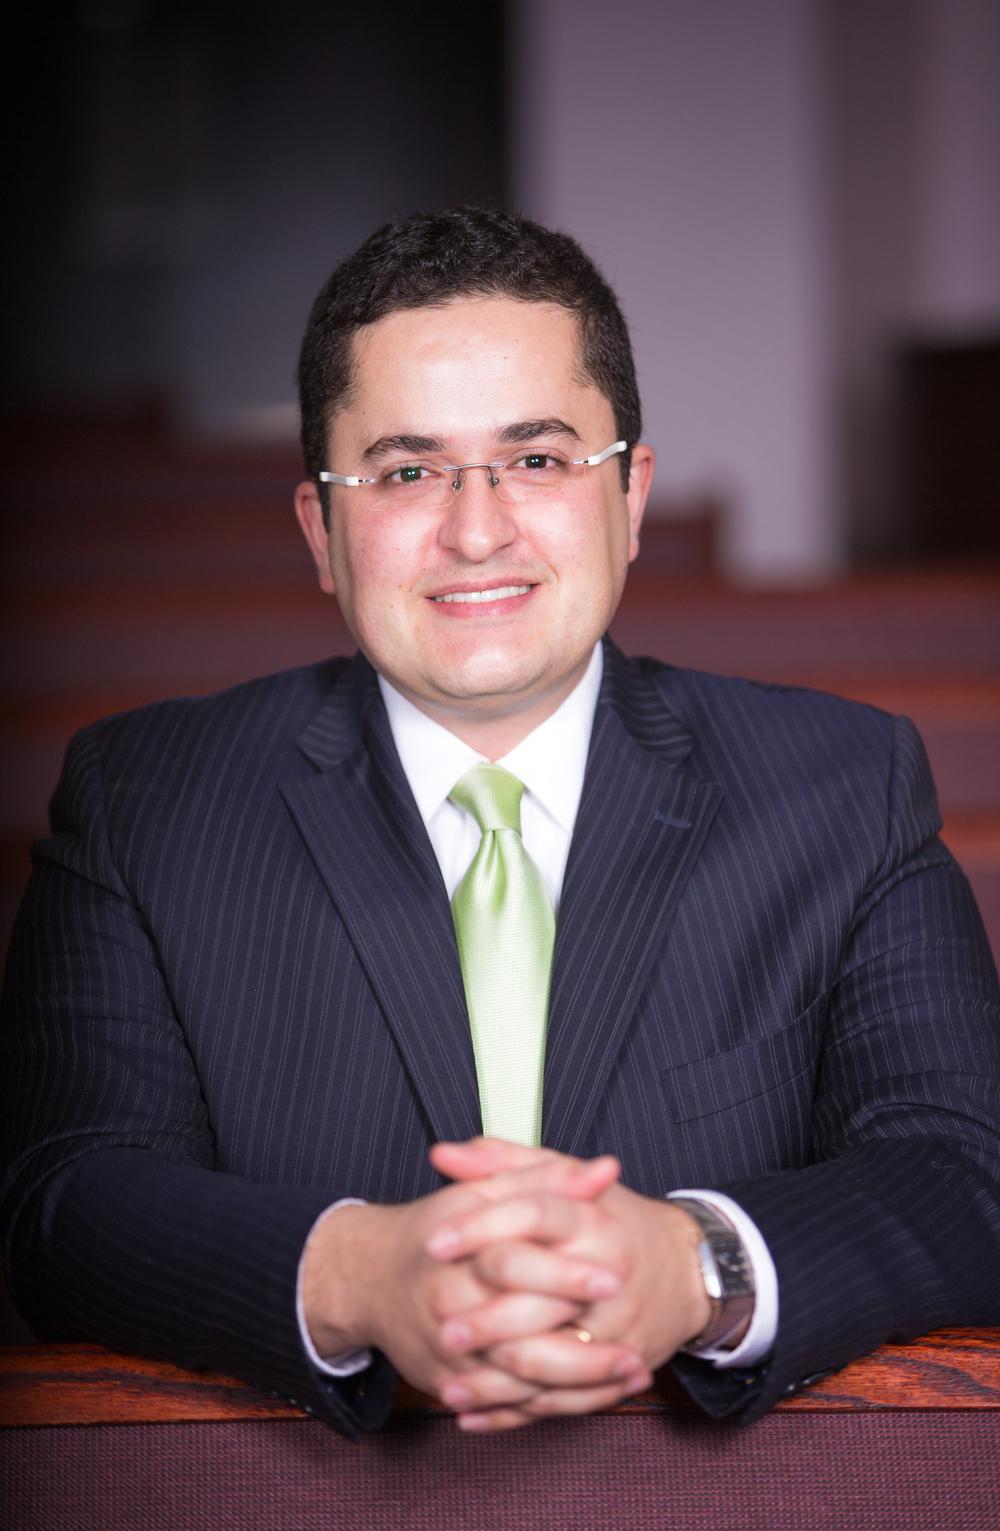 Filipe Drumond, Evangelist